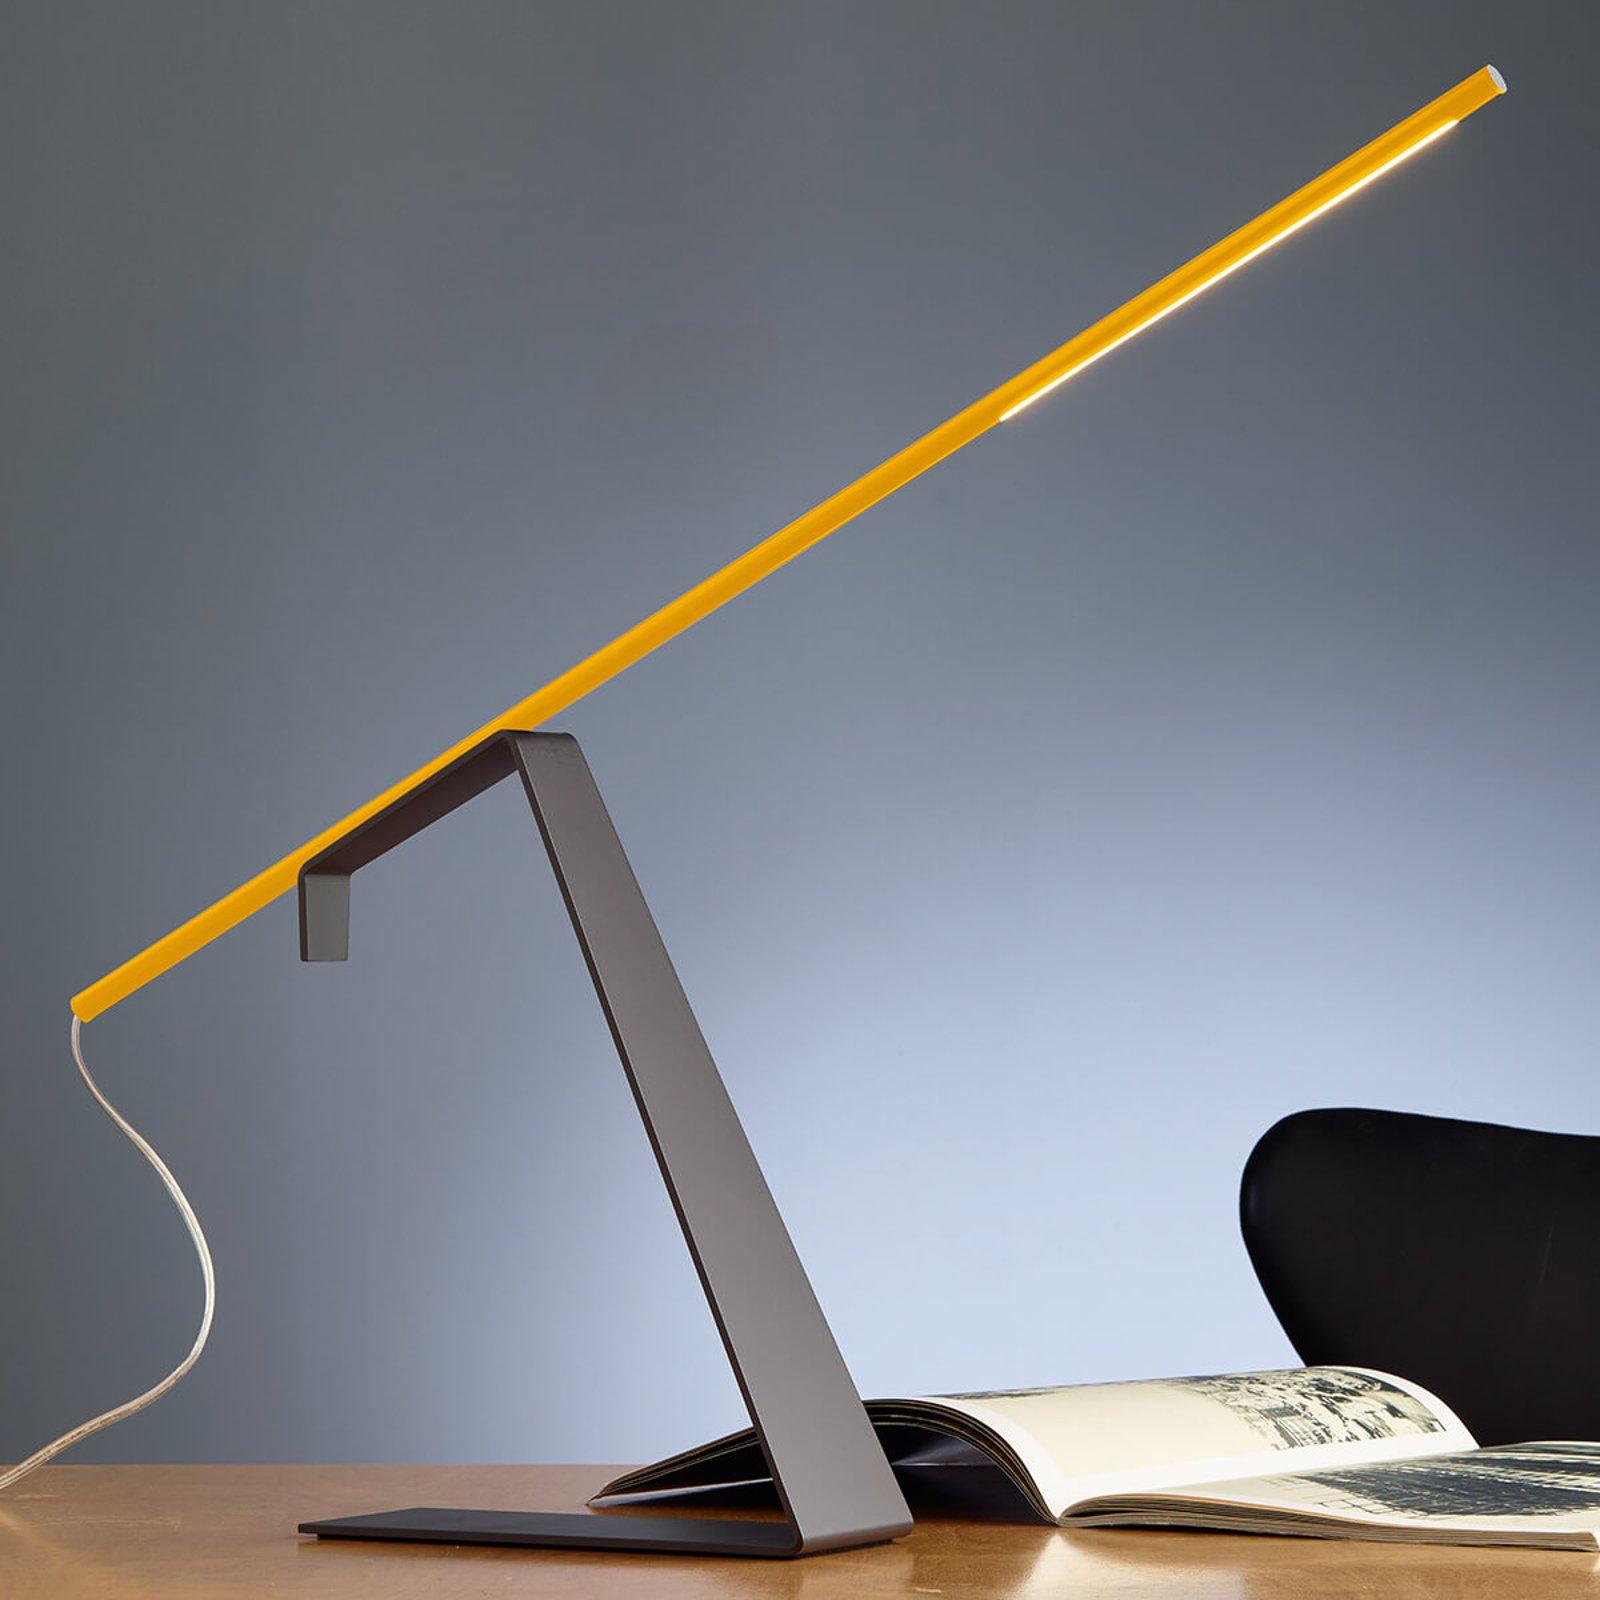 Jella gul designerskrivebordslampe med LED-lys